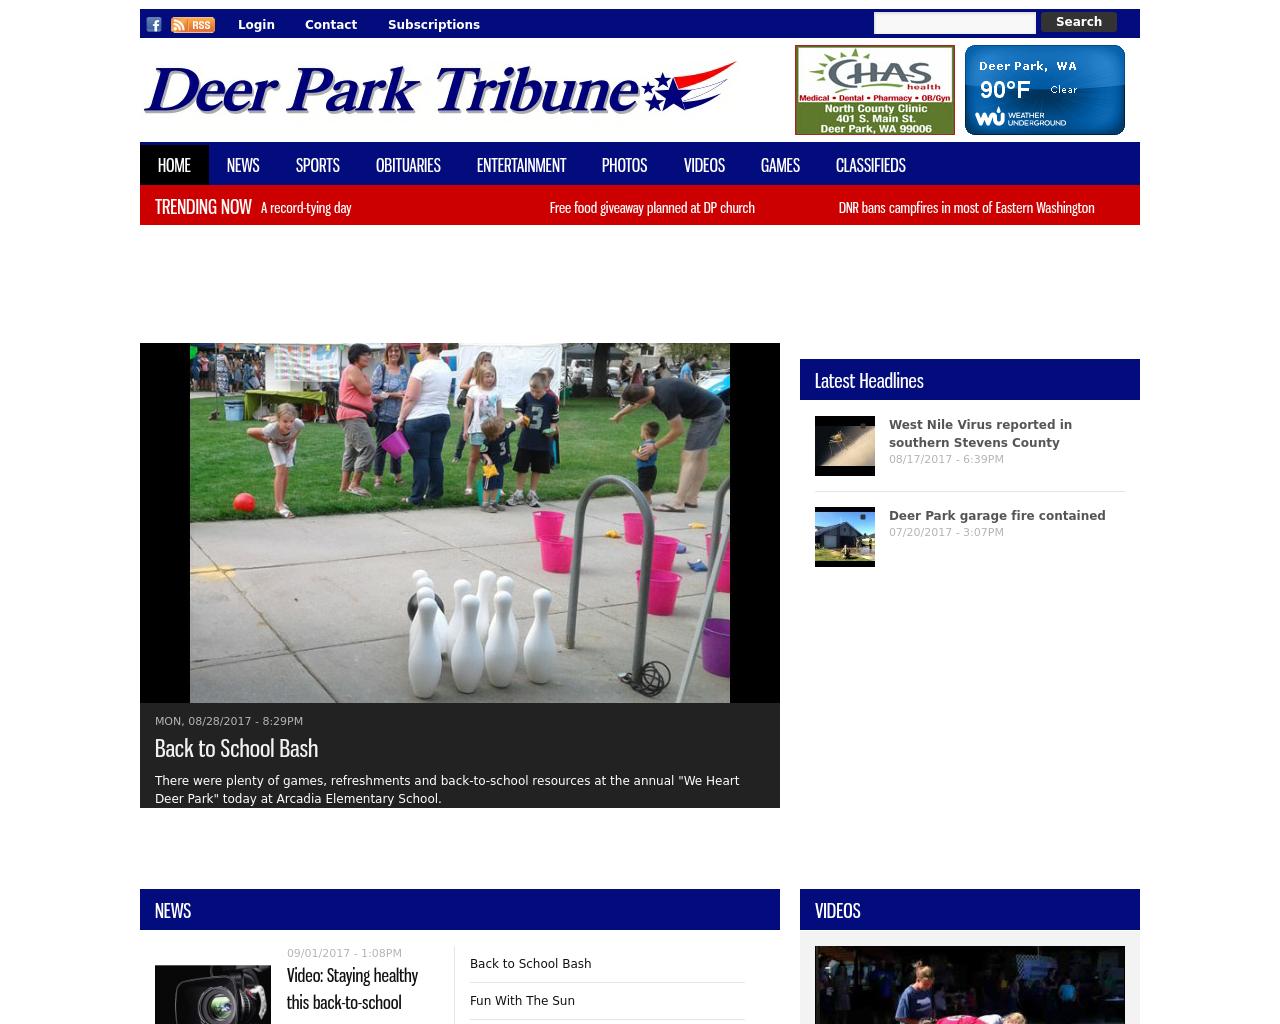 Deer-Park-Tribune-Advertising-Reviews-Pricing